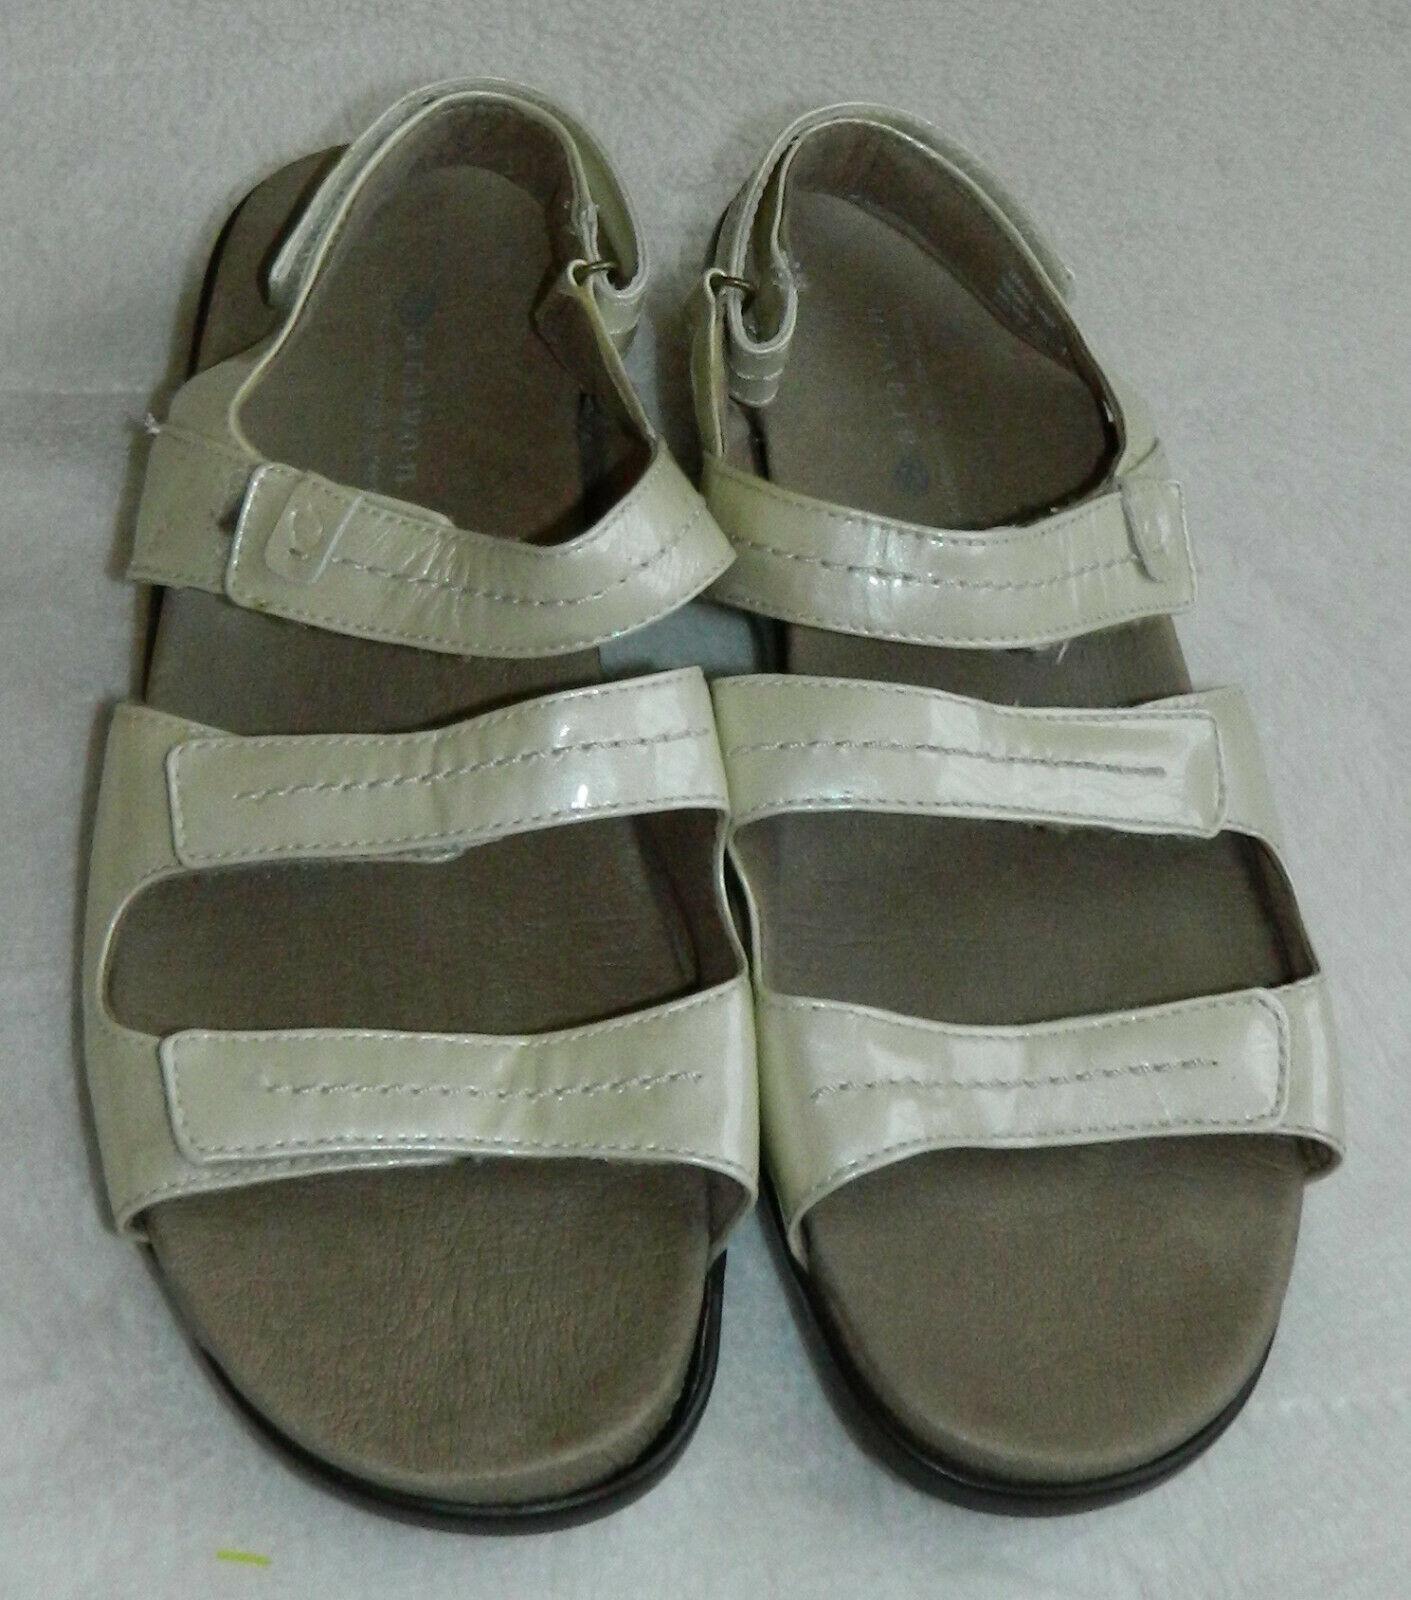 New Balance Aravon Keri Sandals Slingback Womens 11 Leather Cream Orthotic